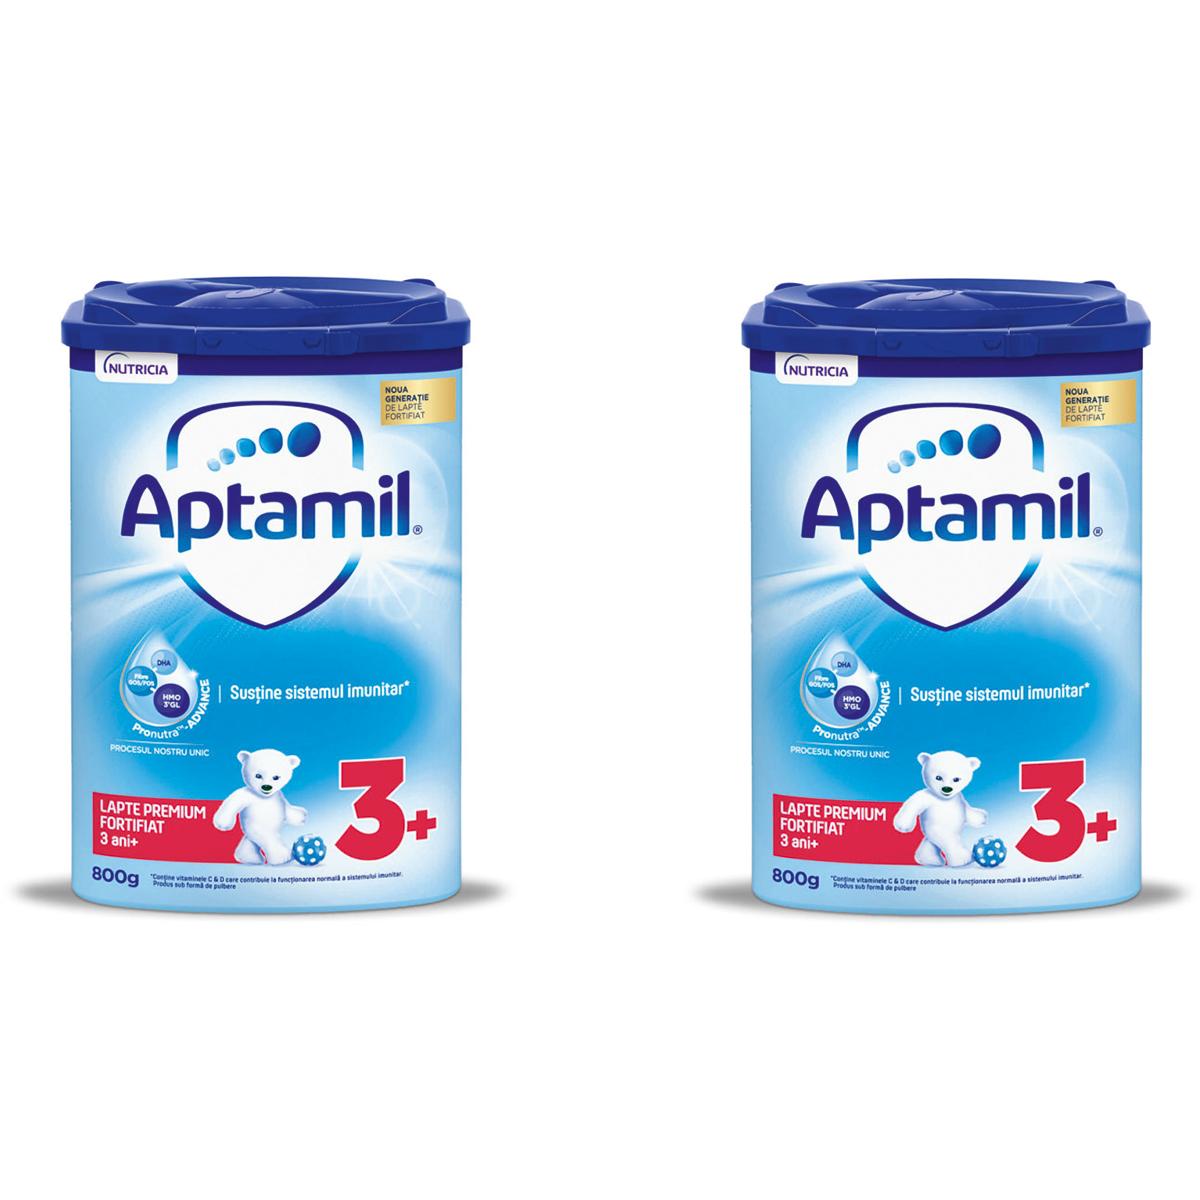 Lapte praf Aptamil Junior 3+, 2 pachete x 800 g imagine